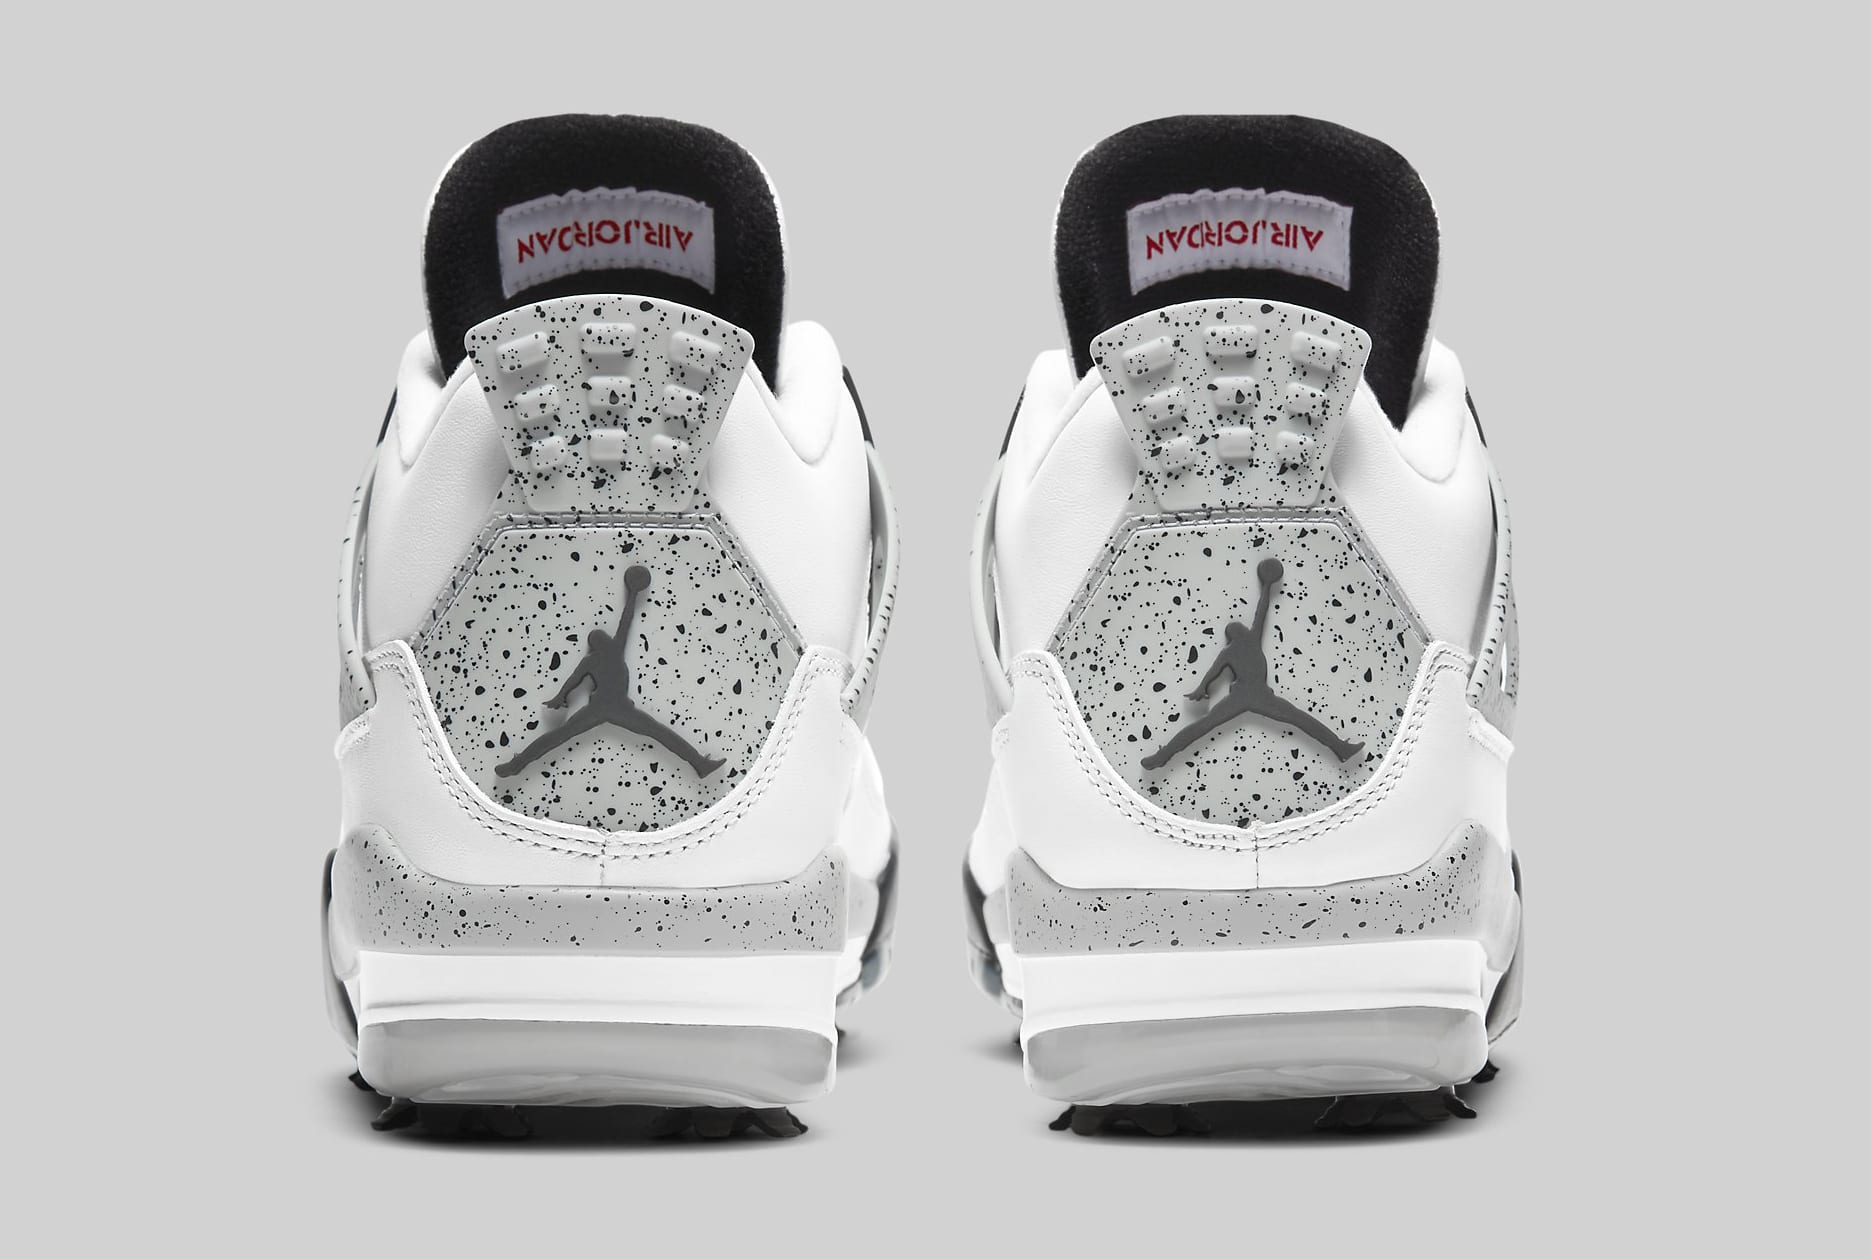 Air Jordan 4 Golf 'White Cement' CU9981-100 Heel